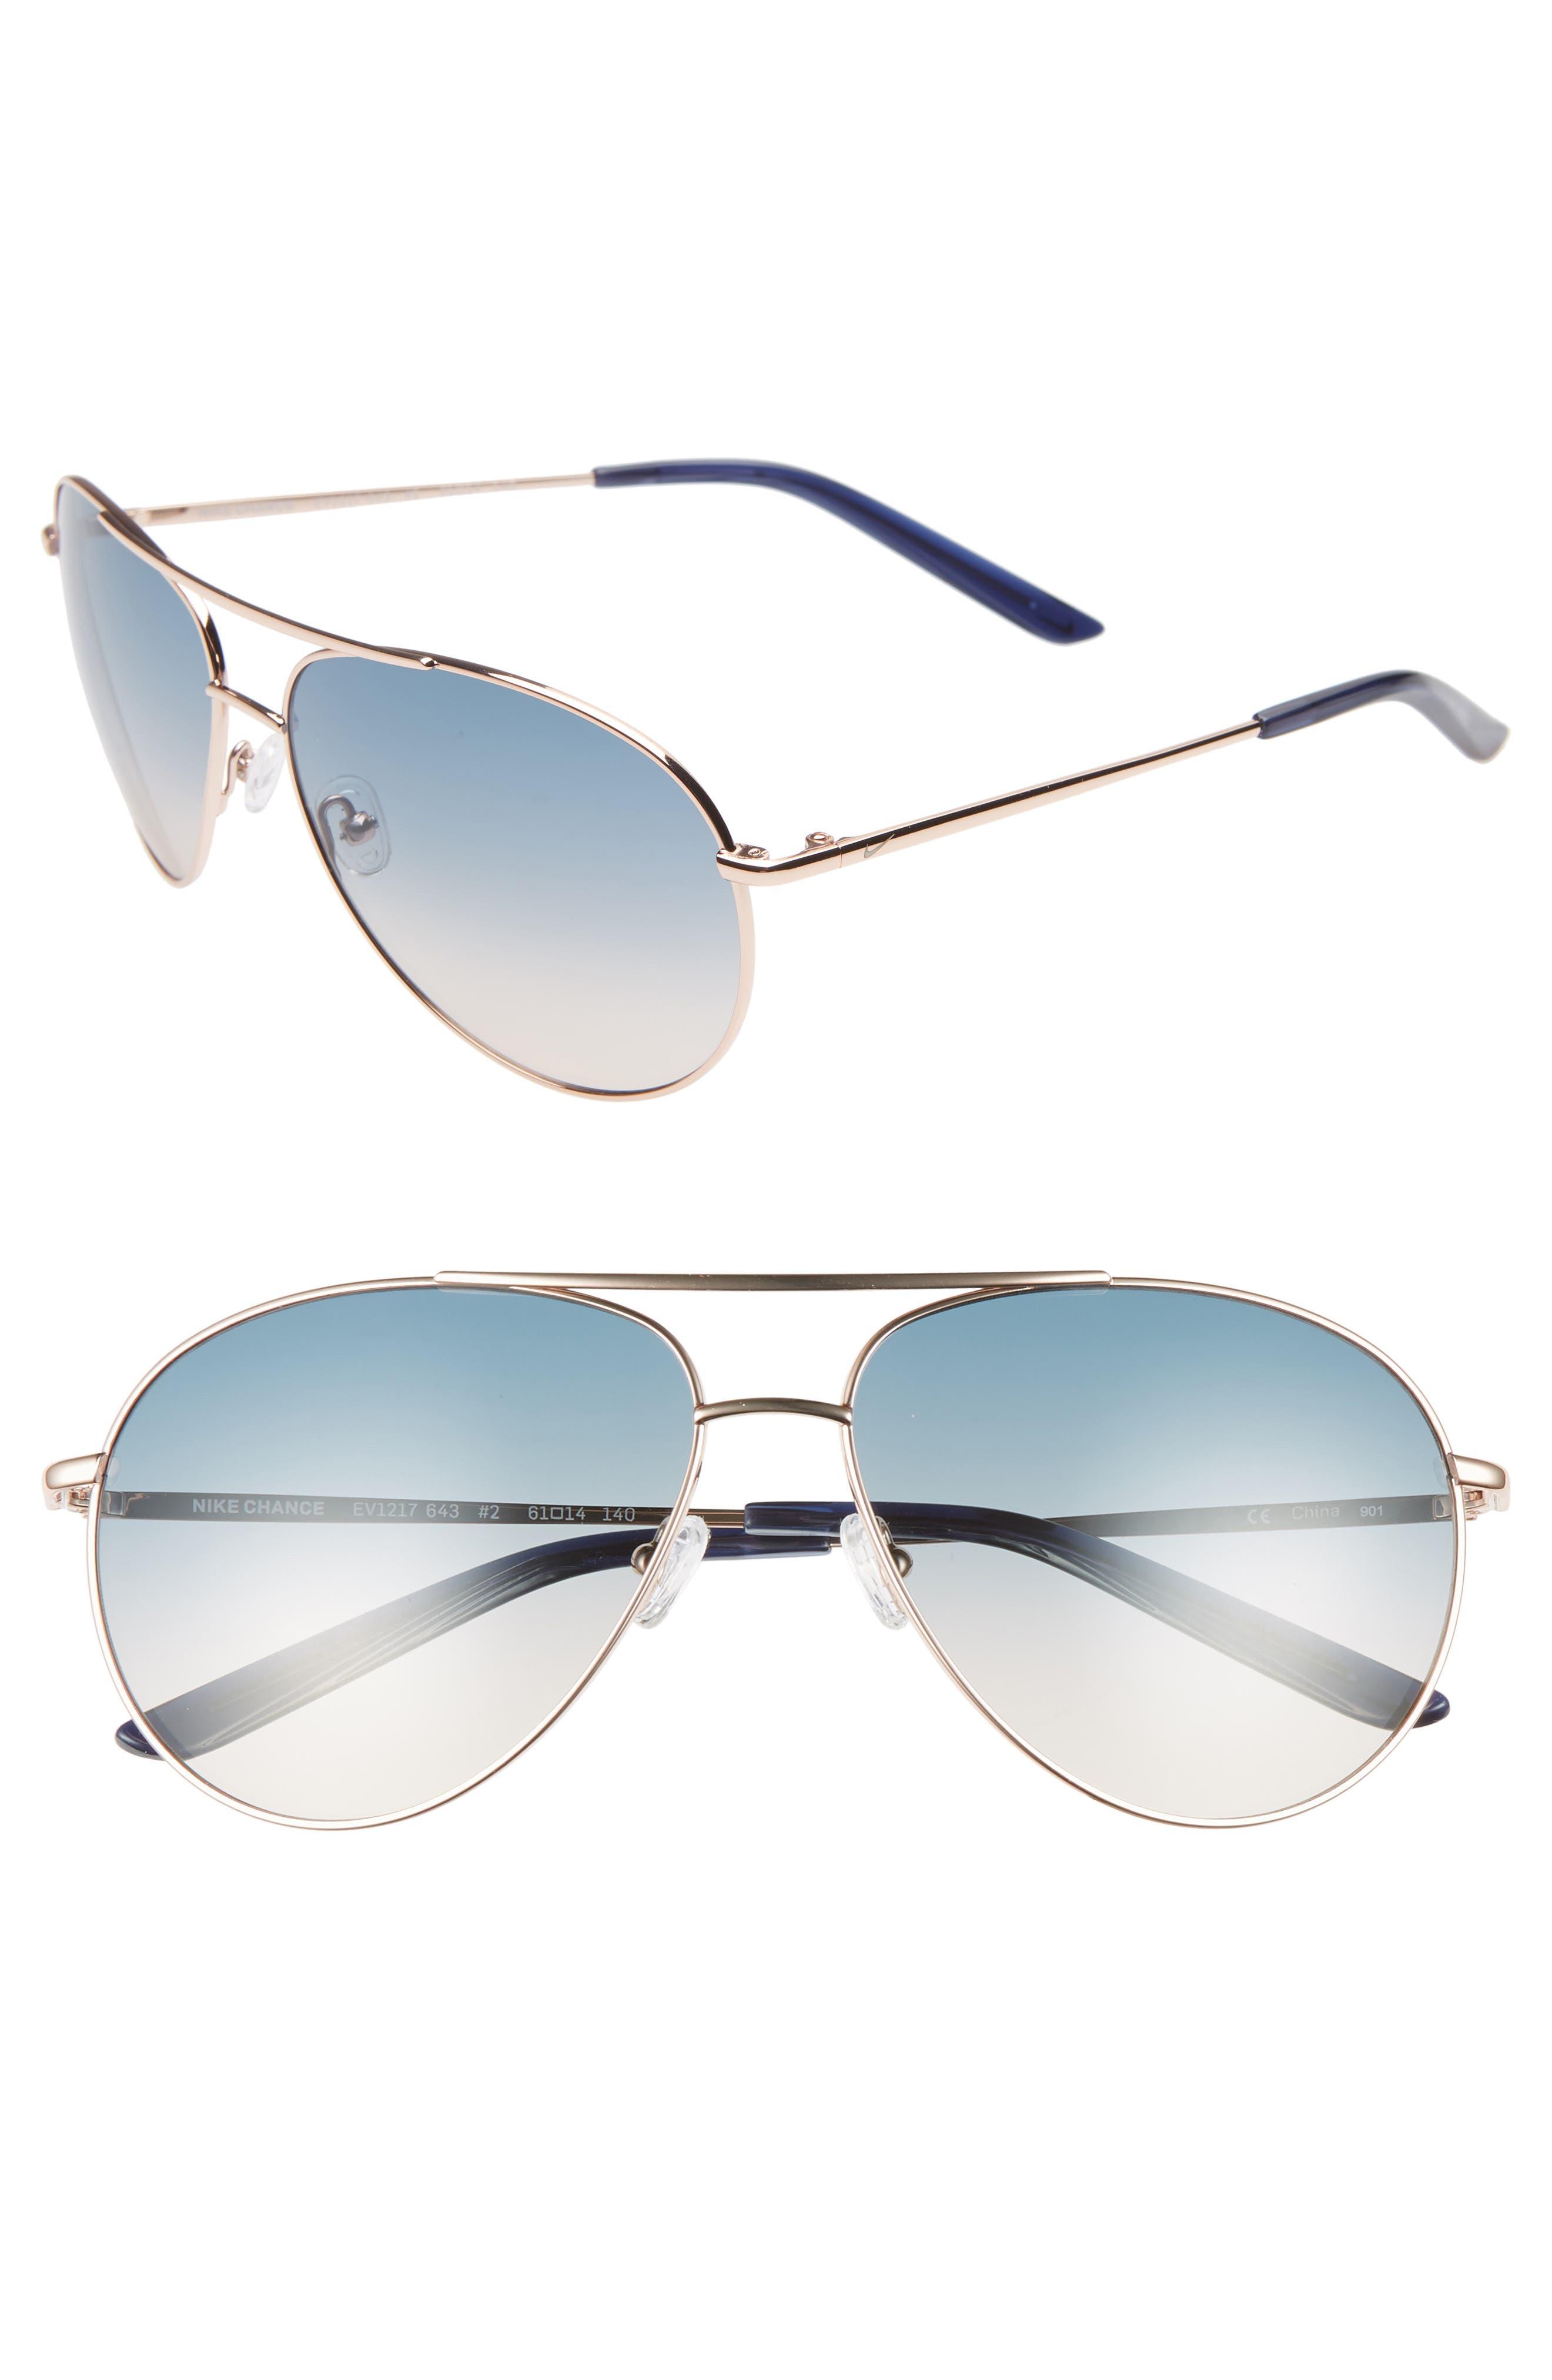 Nike Chance 61Mm Aviator Sunglasses - Rose Gold/ Navy Gradient